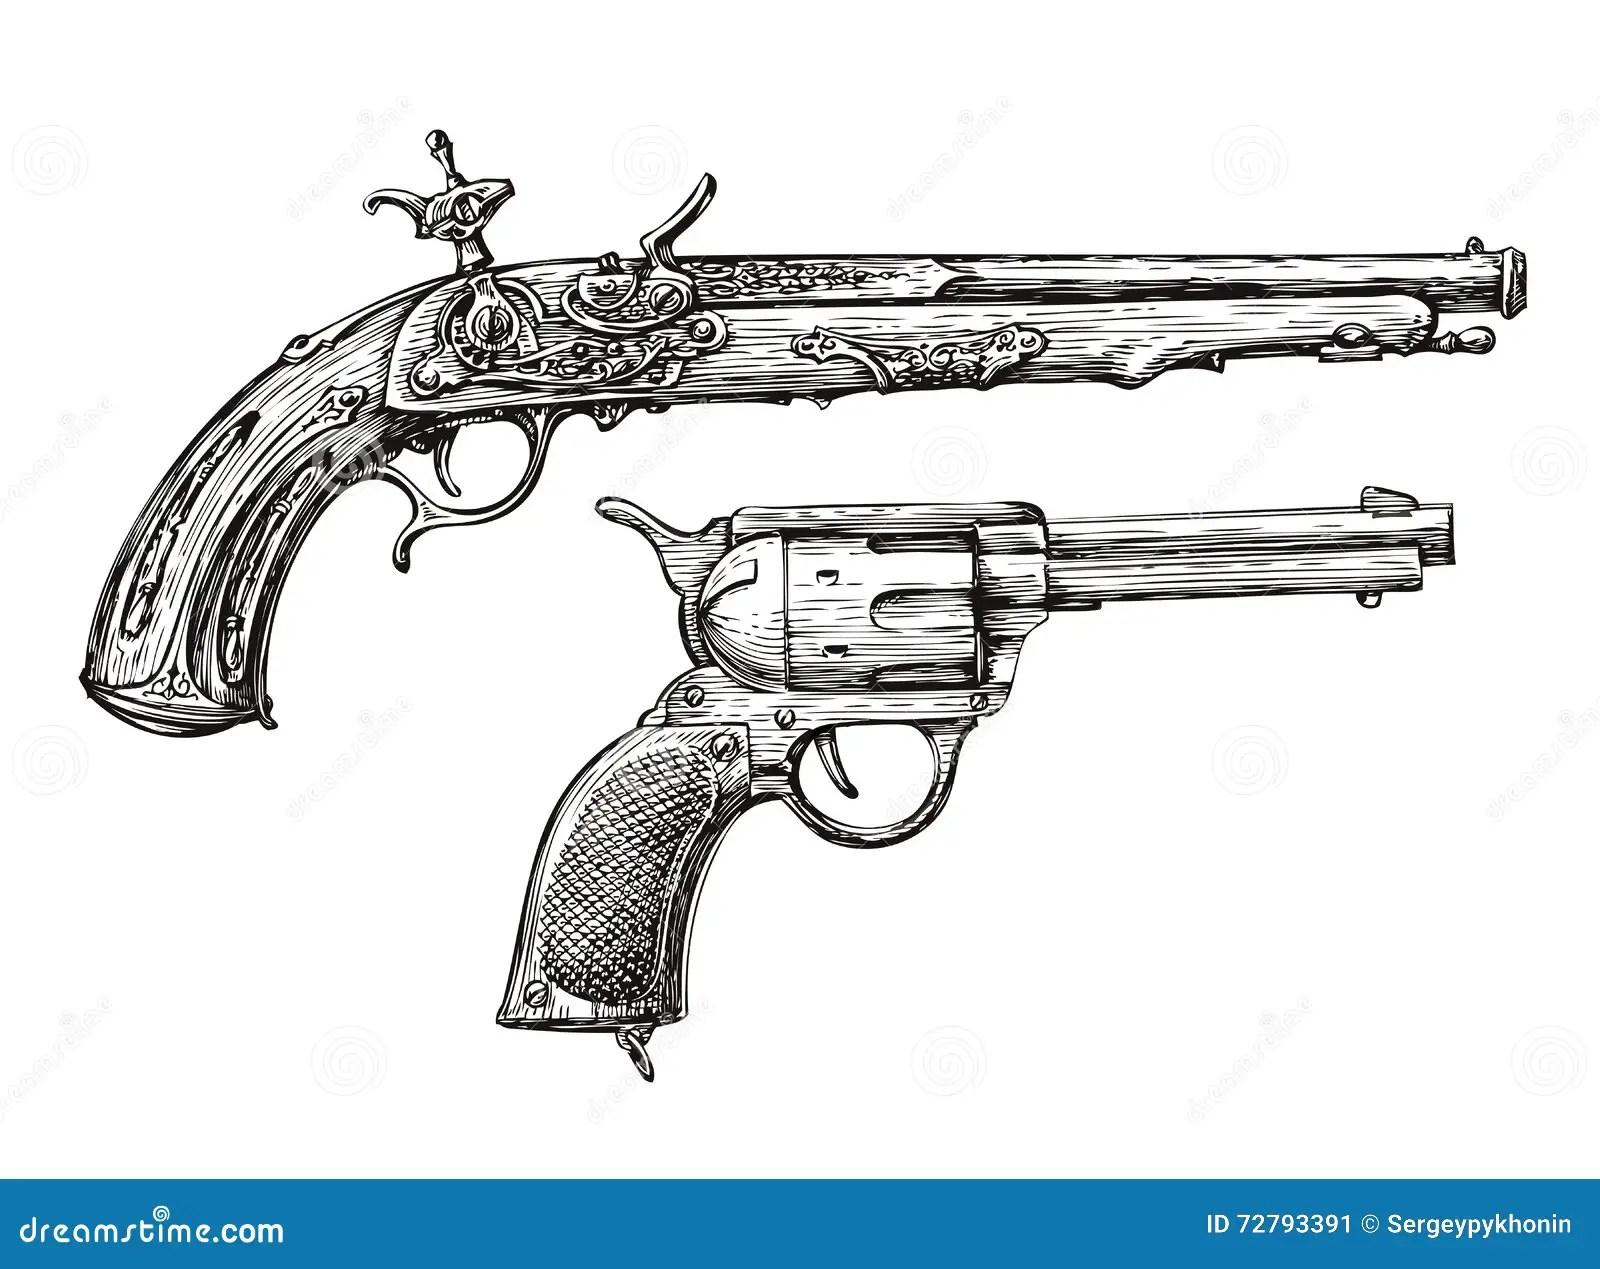 Vintage Gun Retro Pistol Musket Hand Drawn Sketch Of A